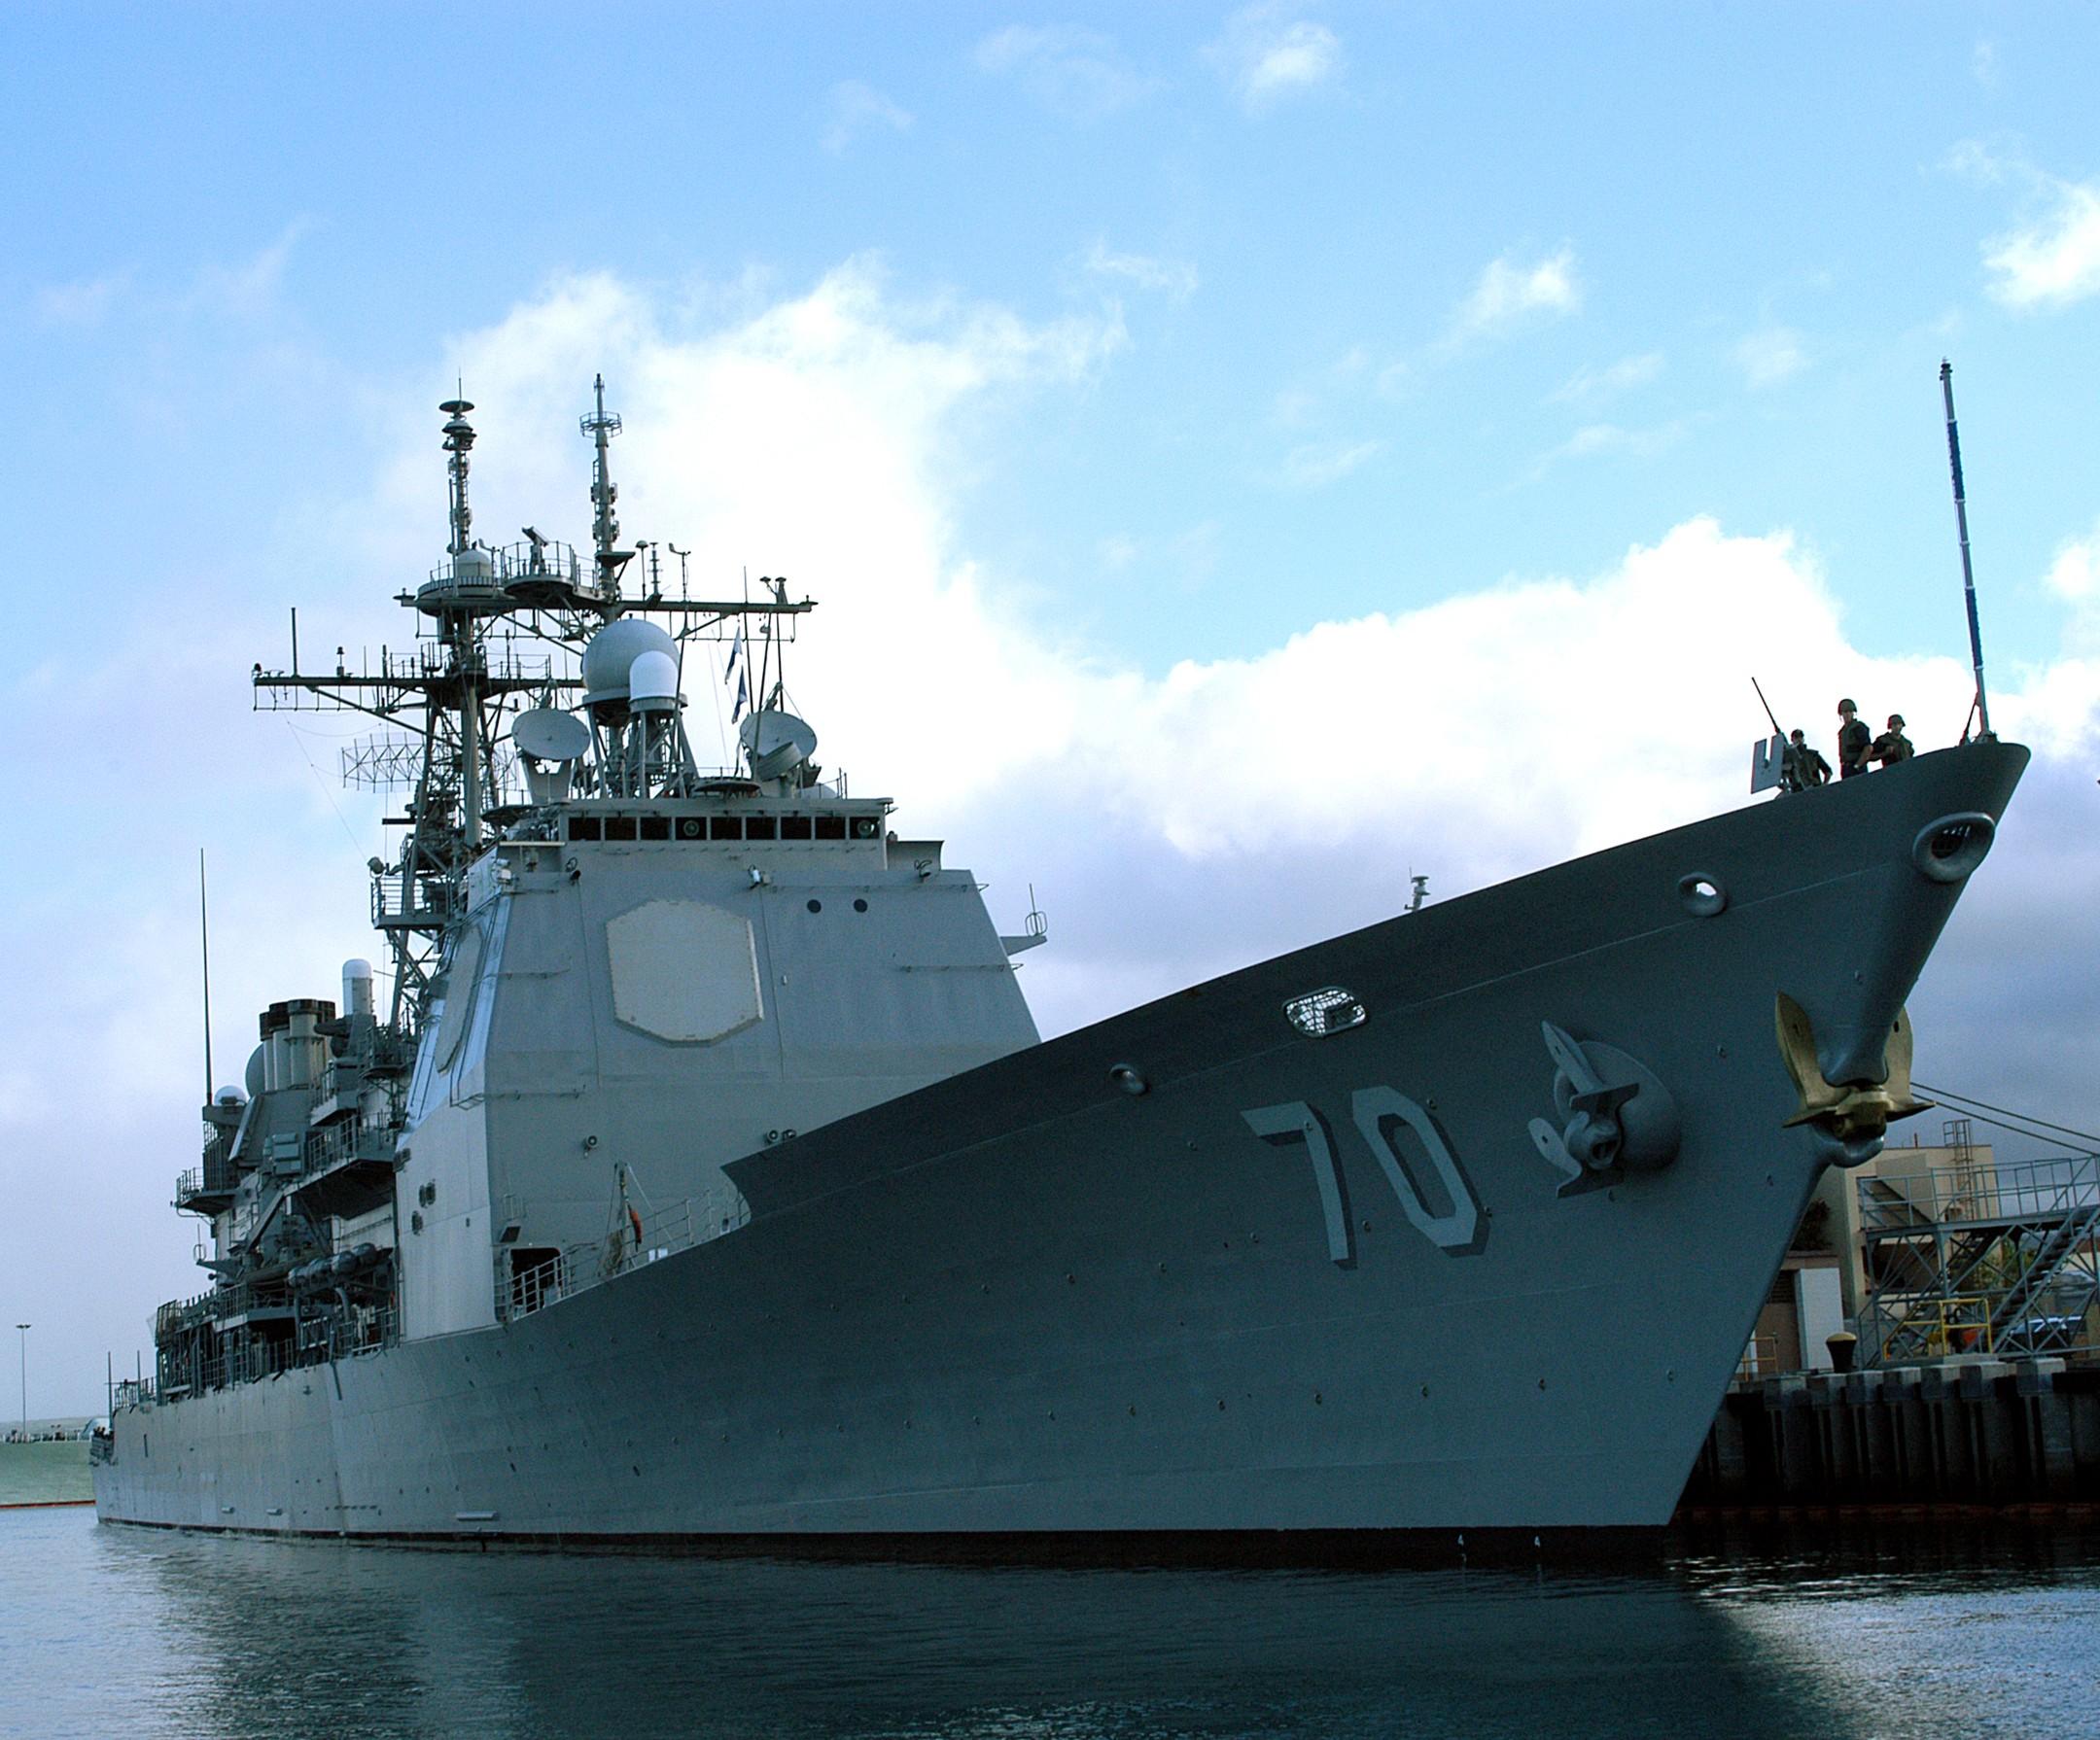 USS Lake Erie in port 04017003.jpg